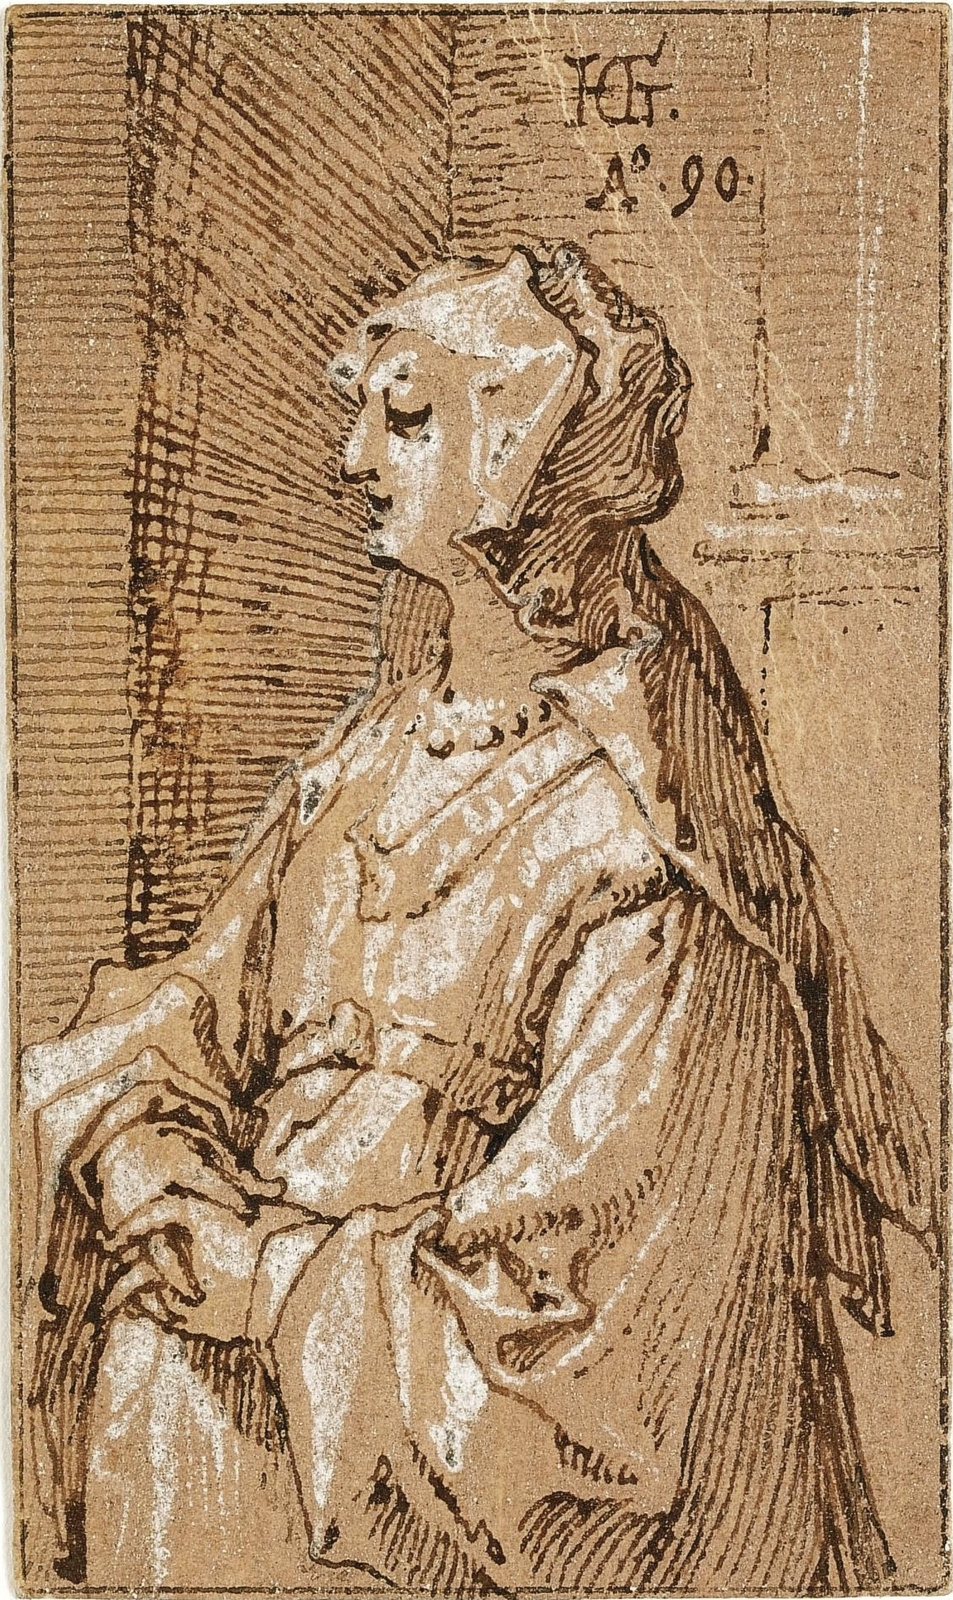 Hendrik Goltzius. Woman with a veil.